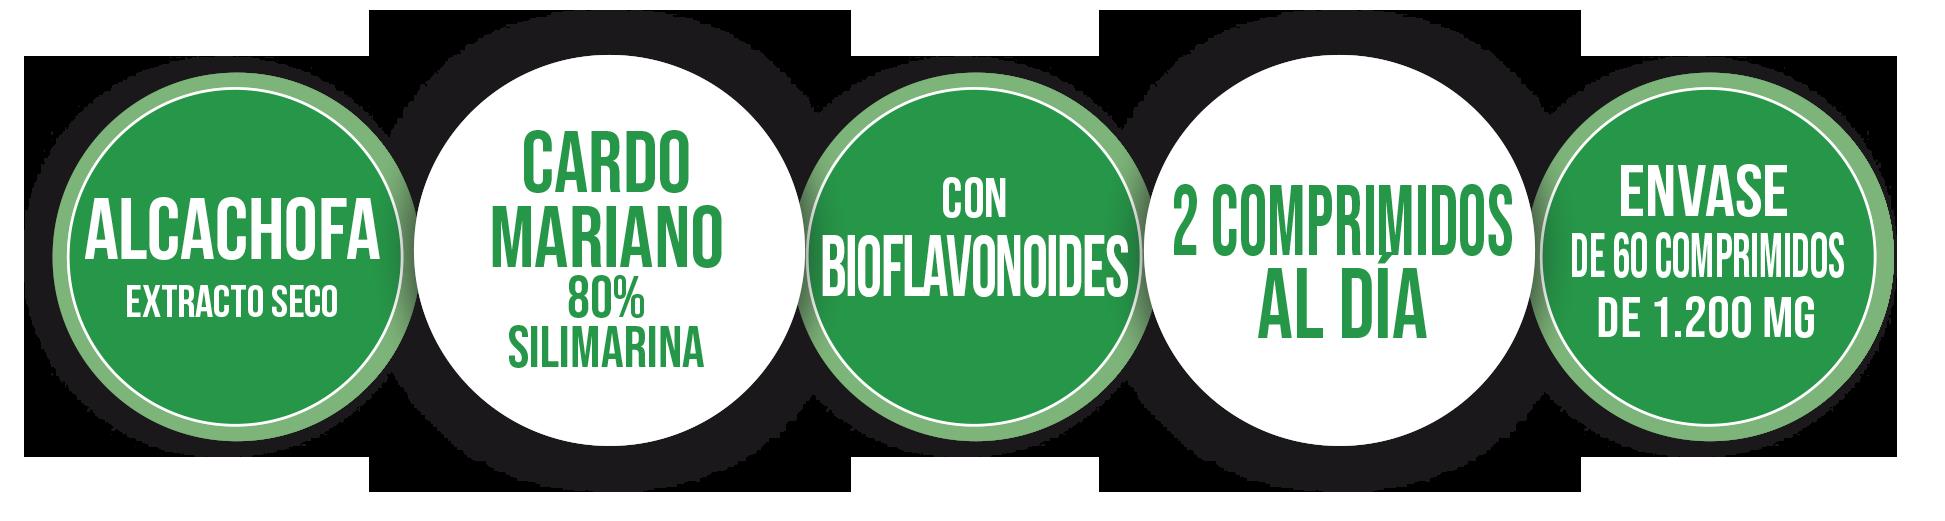 vitamina B-2 Drenaclean/® 720 mg 60 comprimidos con cardo mariano cola de caballo boldo t/é verde bioflavonoides B-1 y Biotina. alcachofa